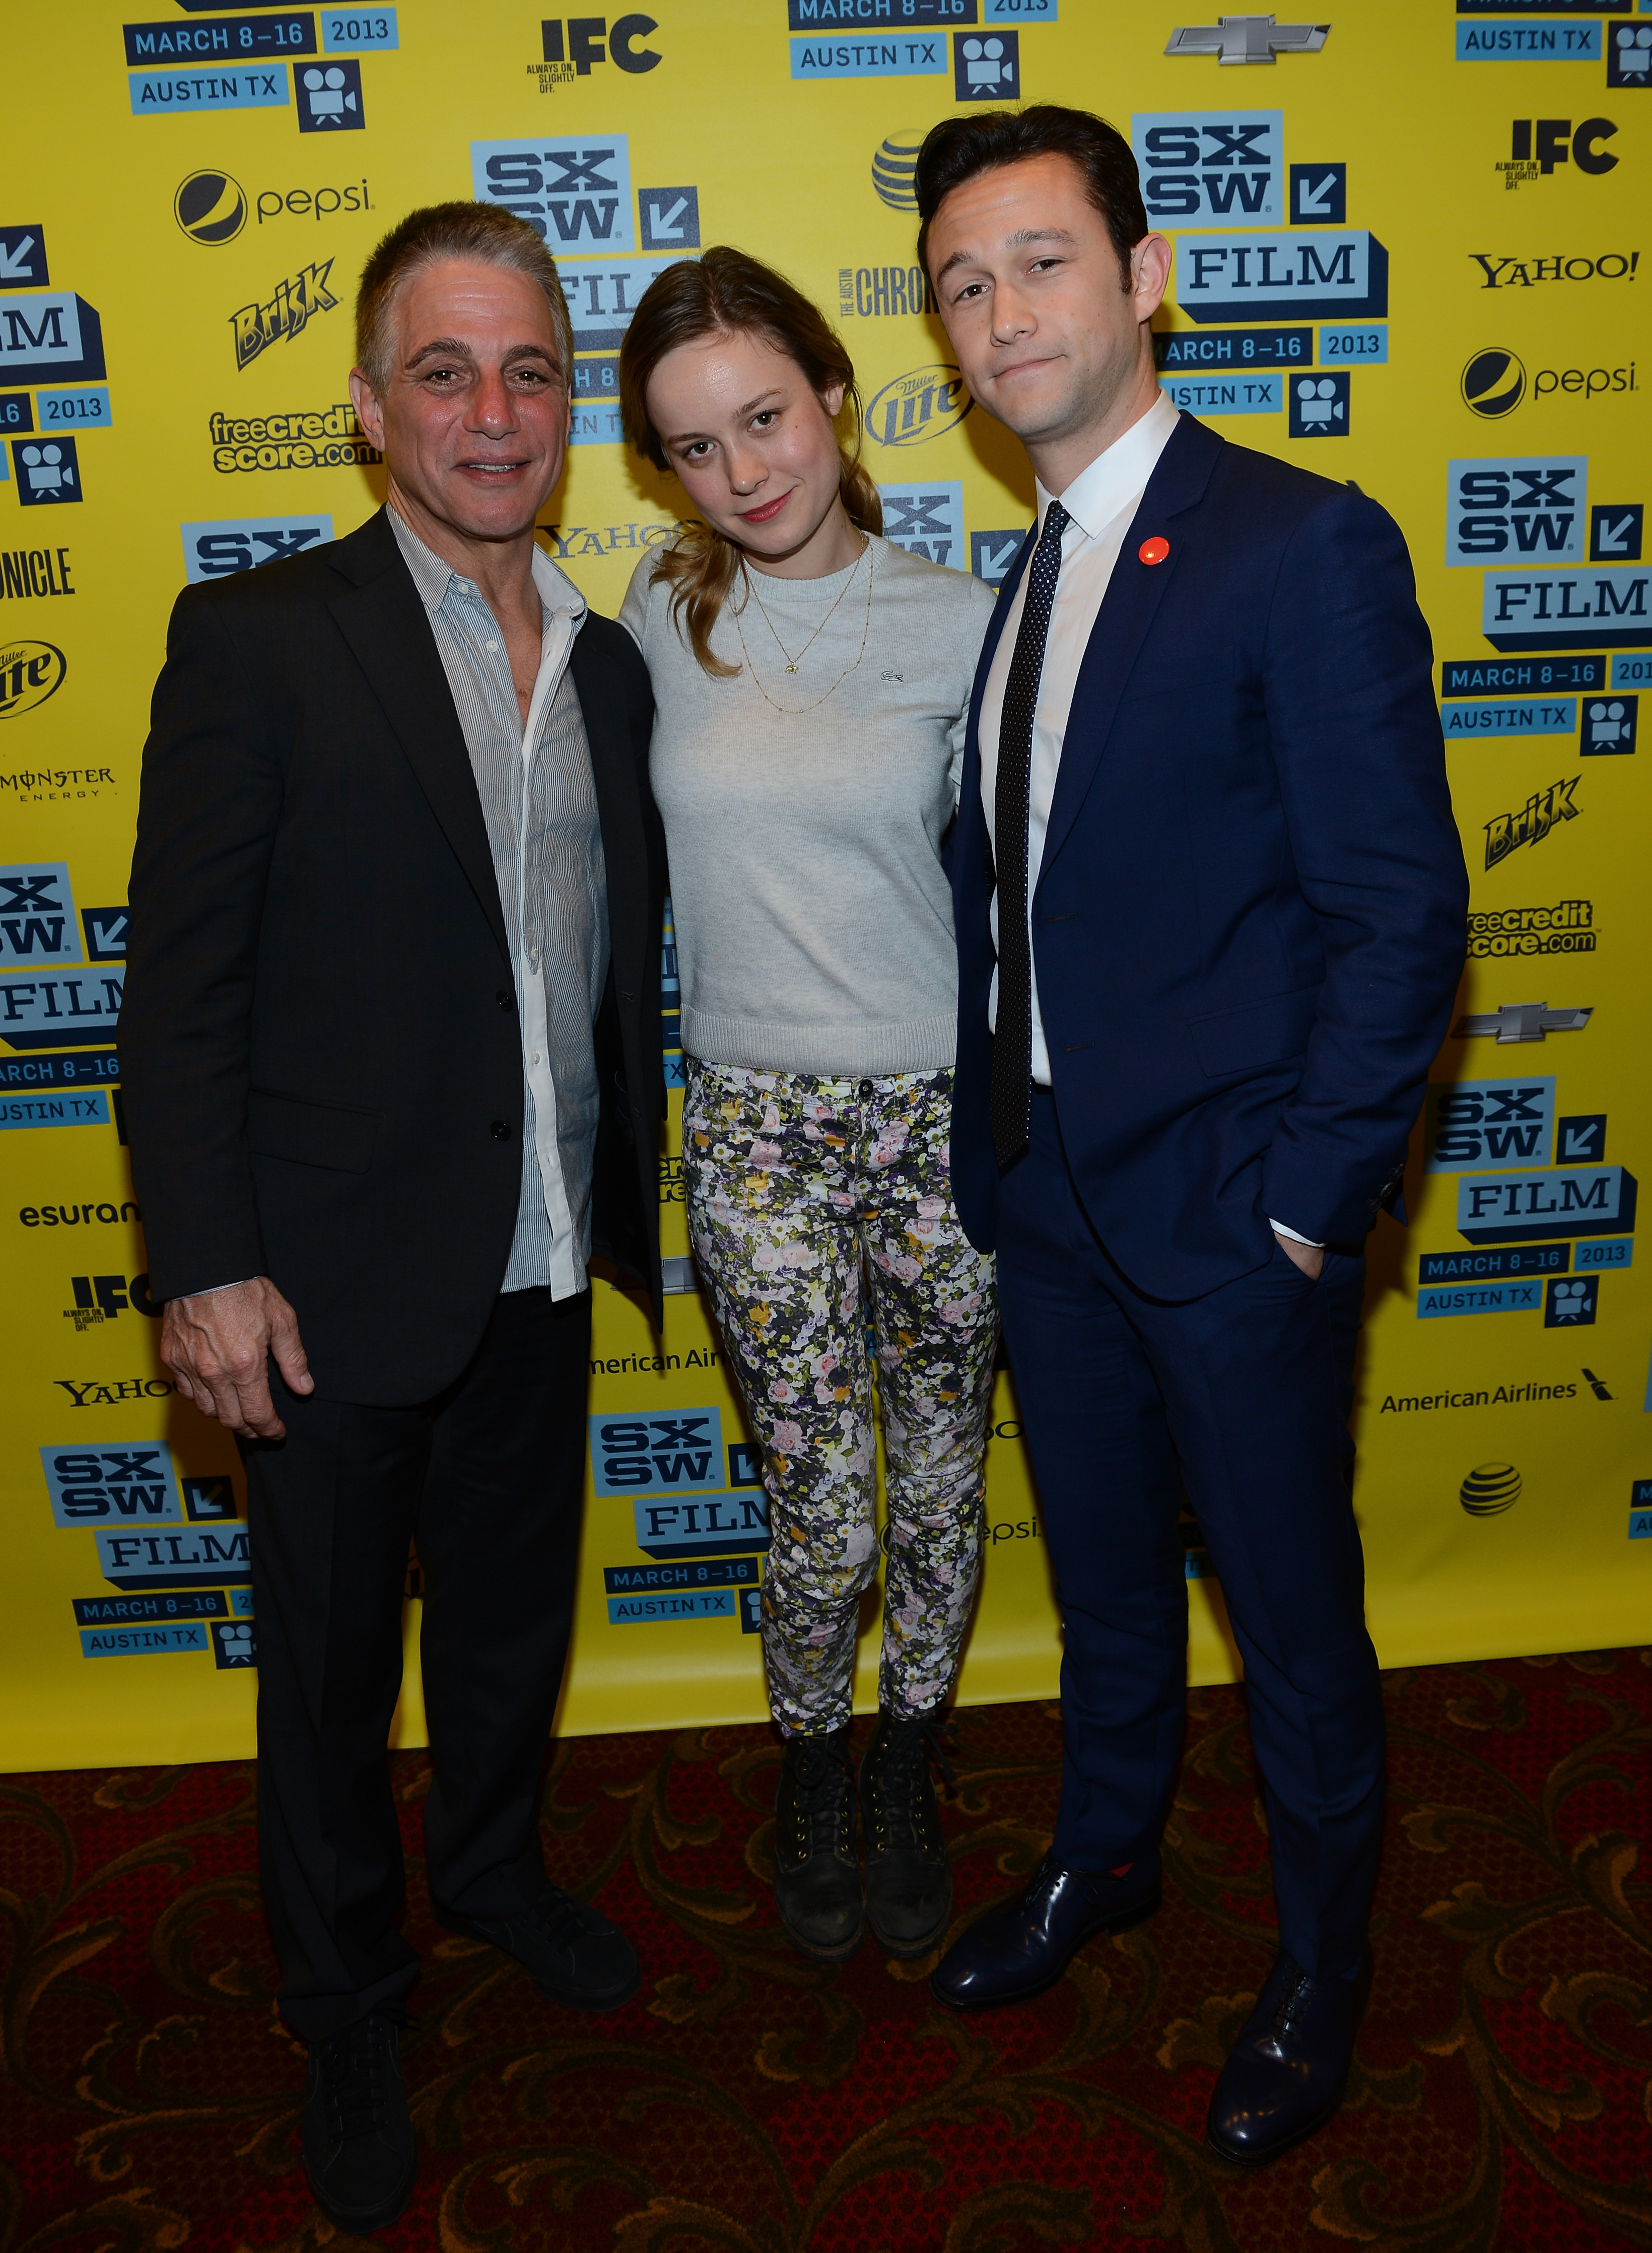 Joseph Gordon-Levitt got together with Tony Danza and Brie Larson for the Don Jon's Addiction red carpet at SXSW.